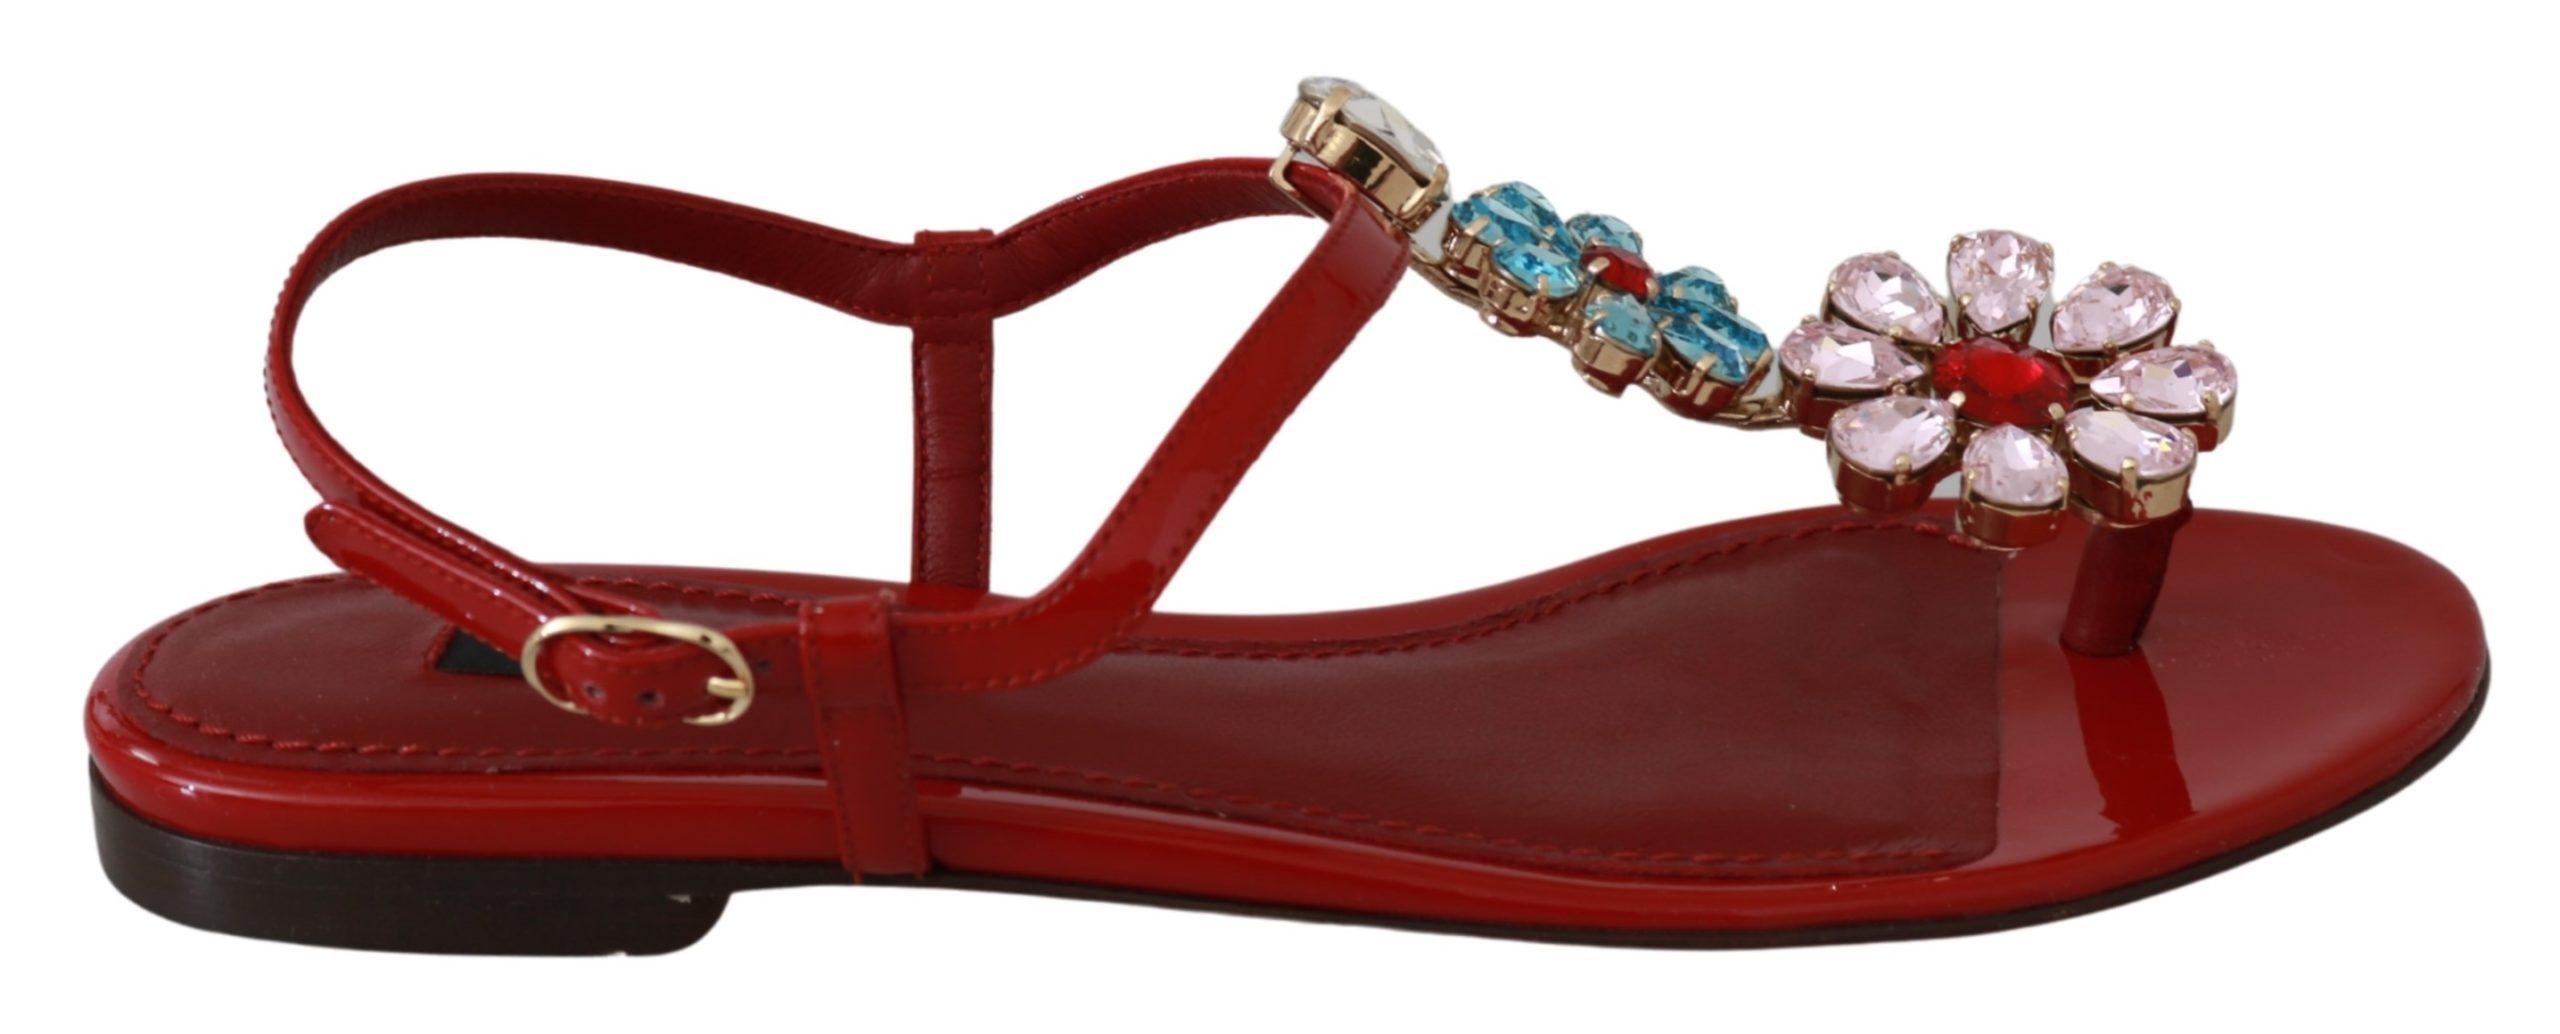 Dolce & Gabbana Women's Leather Crystal Sandals Red LA6486 - EU35/US4.5